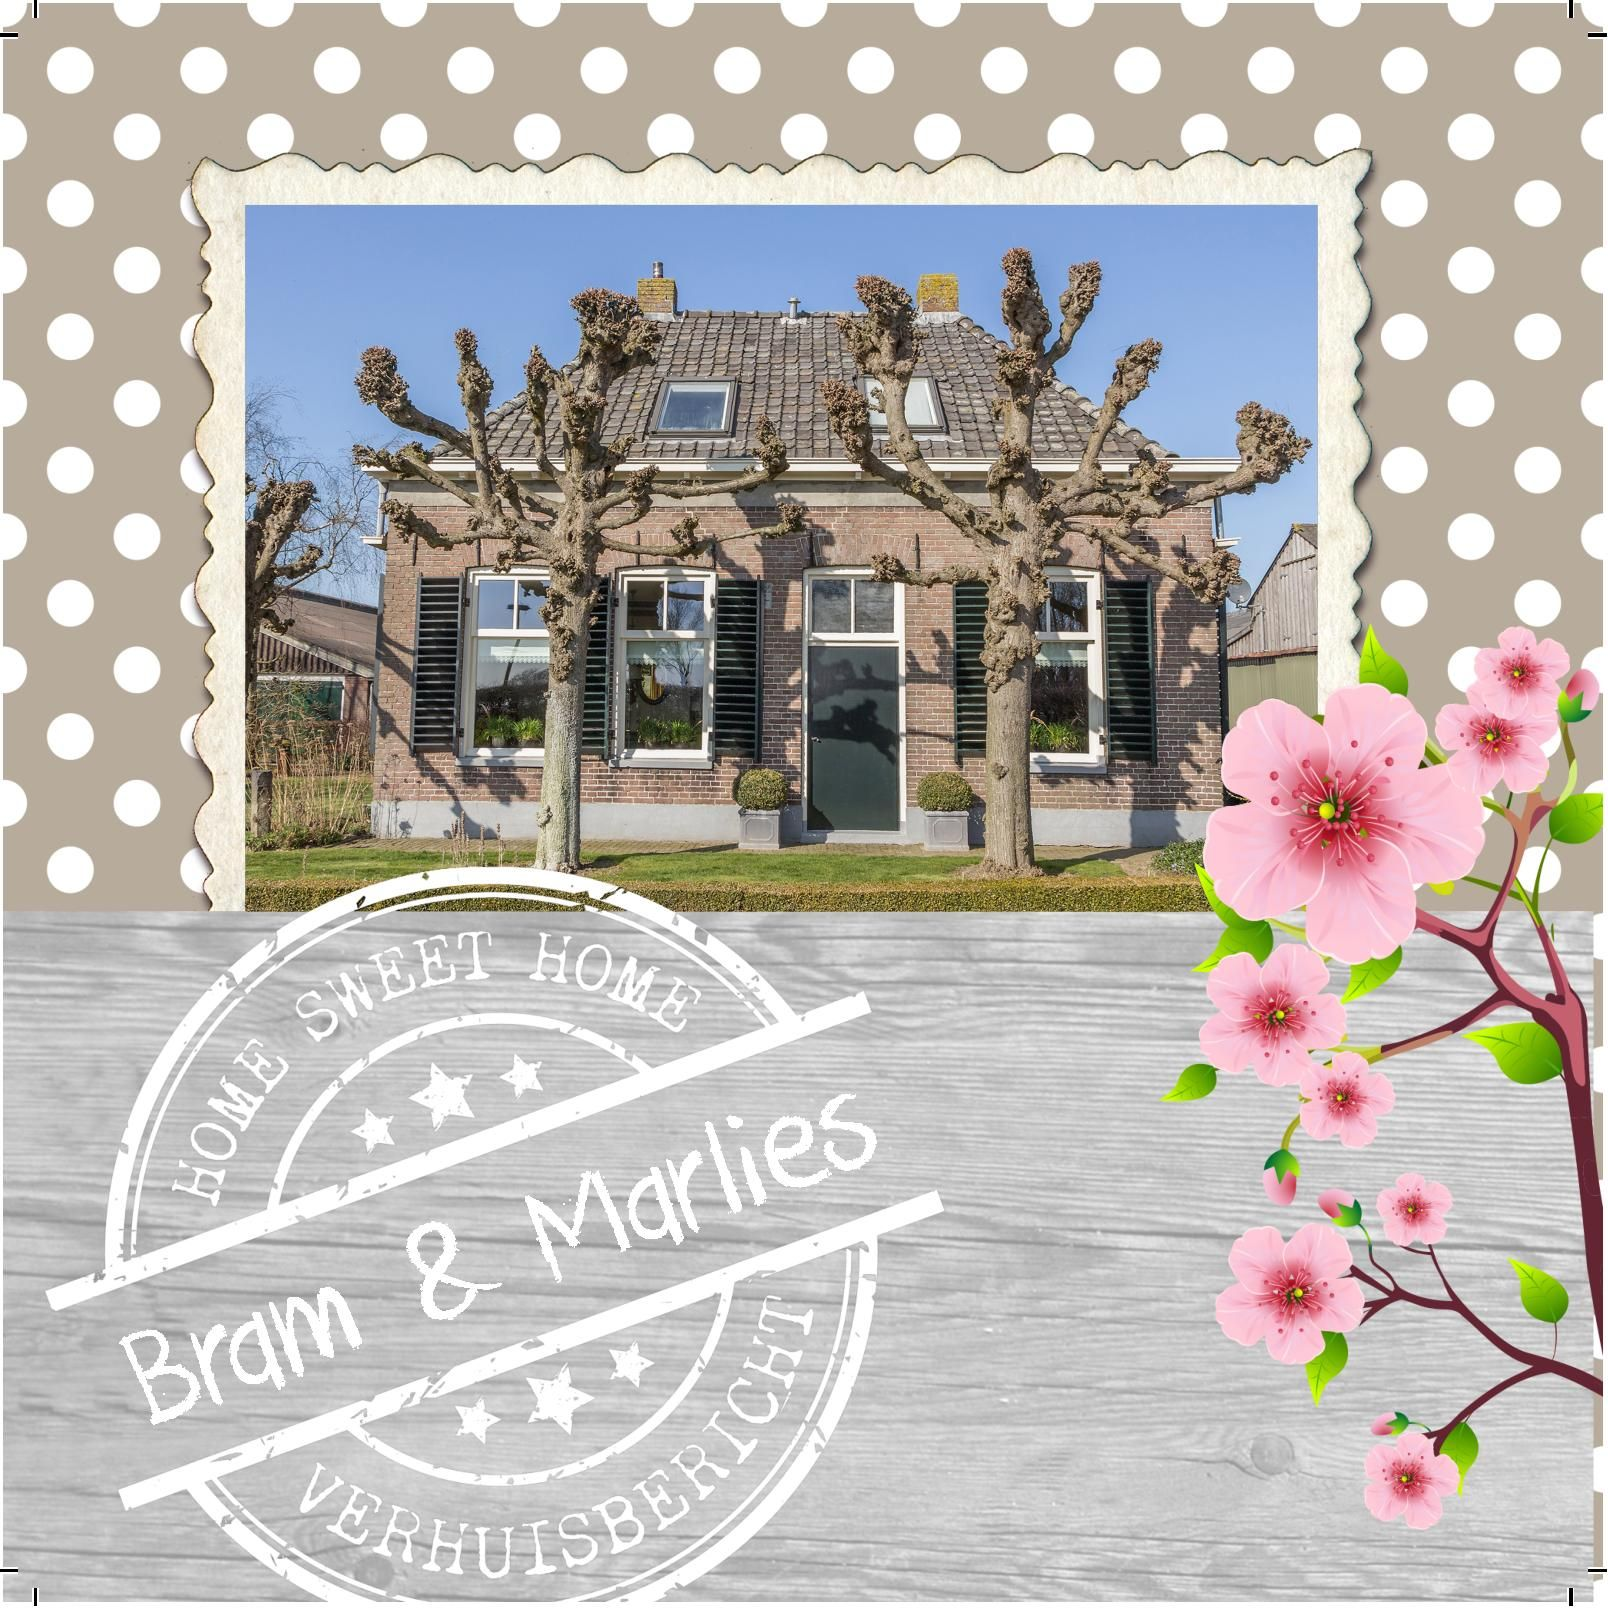 Design: Fastcards www.fastcards.nl - Verhuiskaart verhuisbericht Home Sweet Home